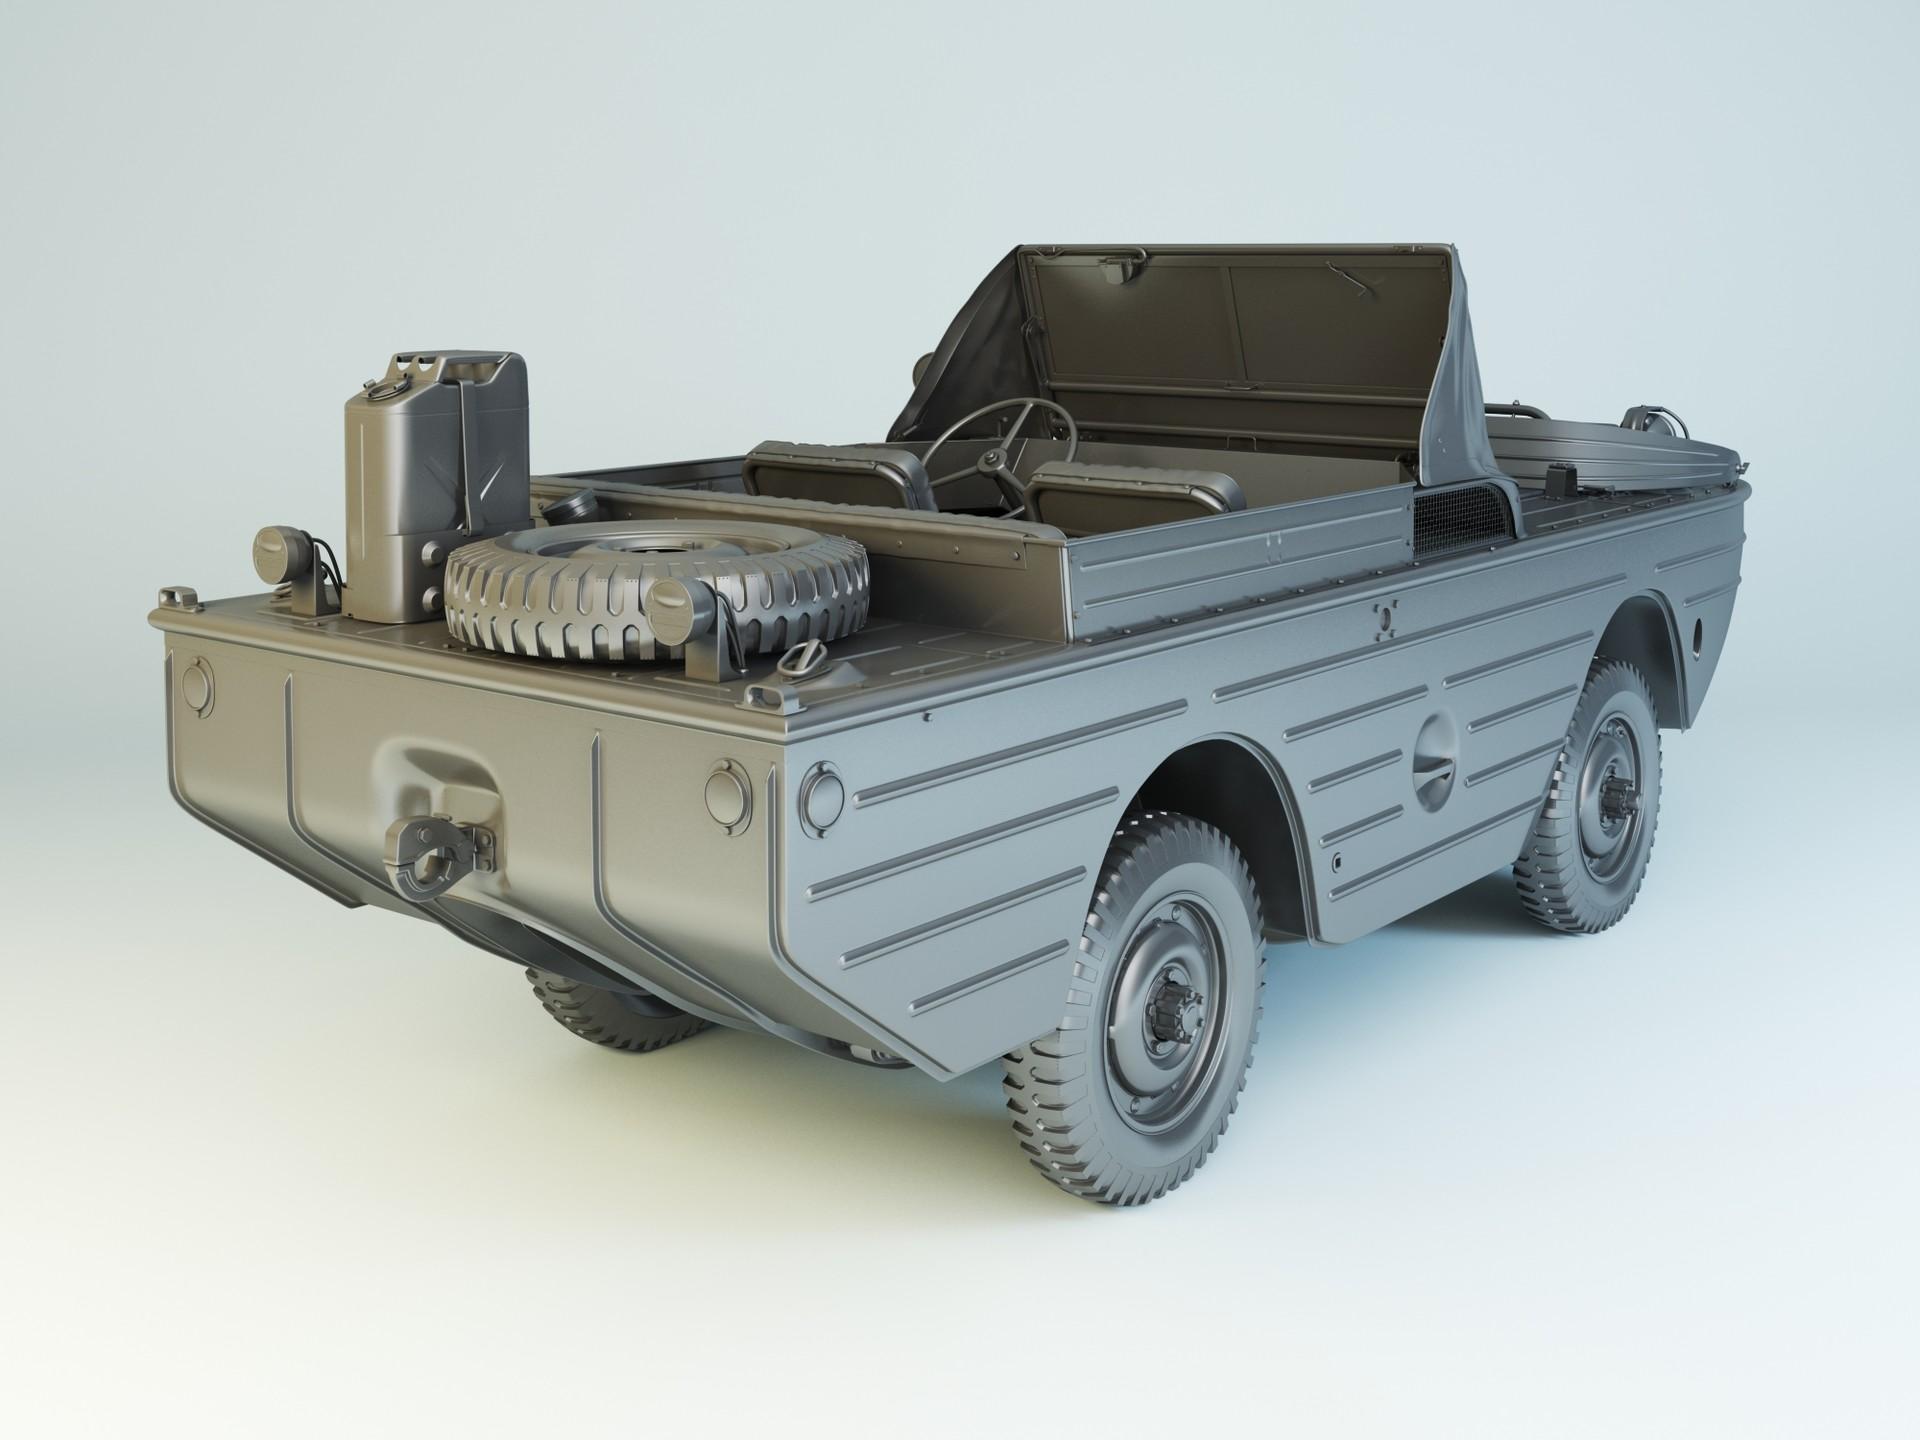 Nail khusnutdinov als 190 007 ford gpa modelling 1